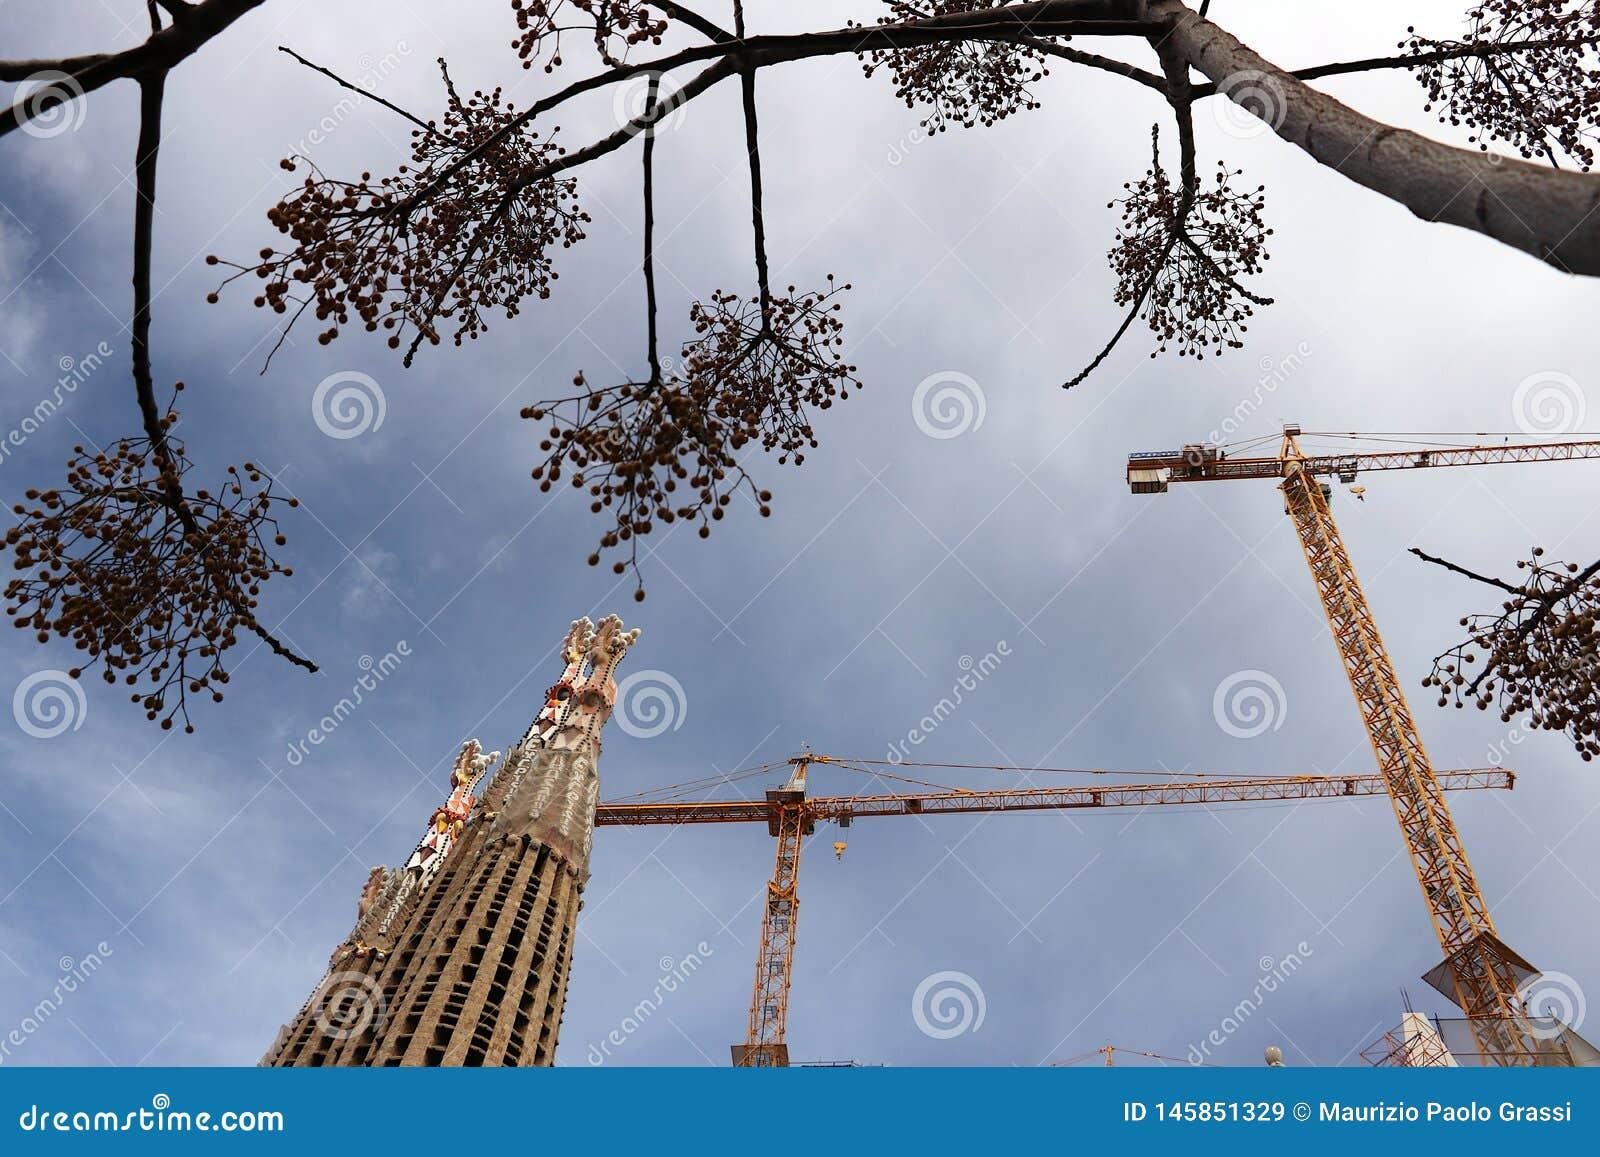 The construction site of the Sagrada Familia originally designed by Antoni Gaudi